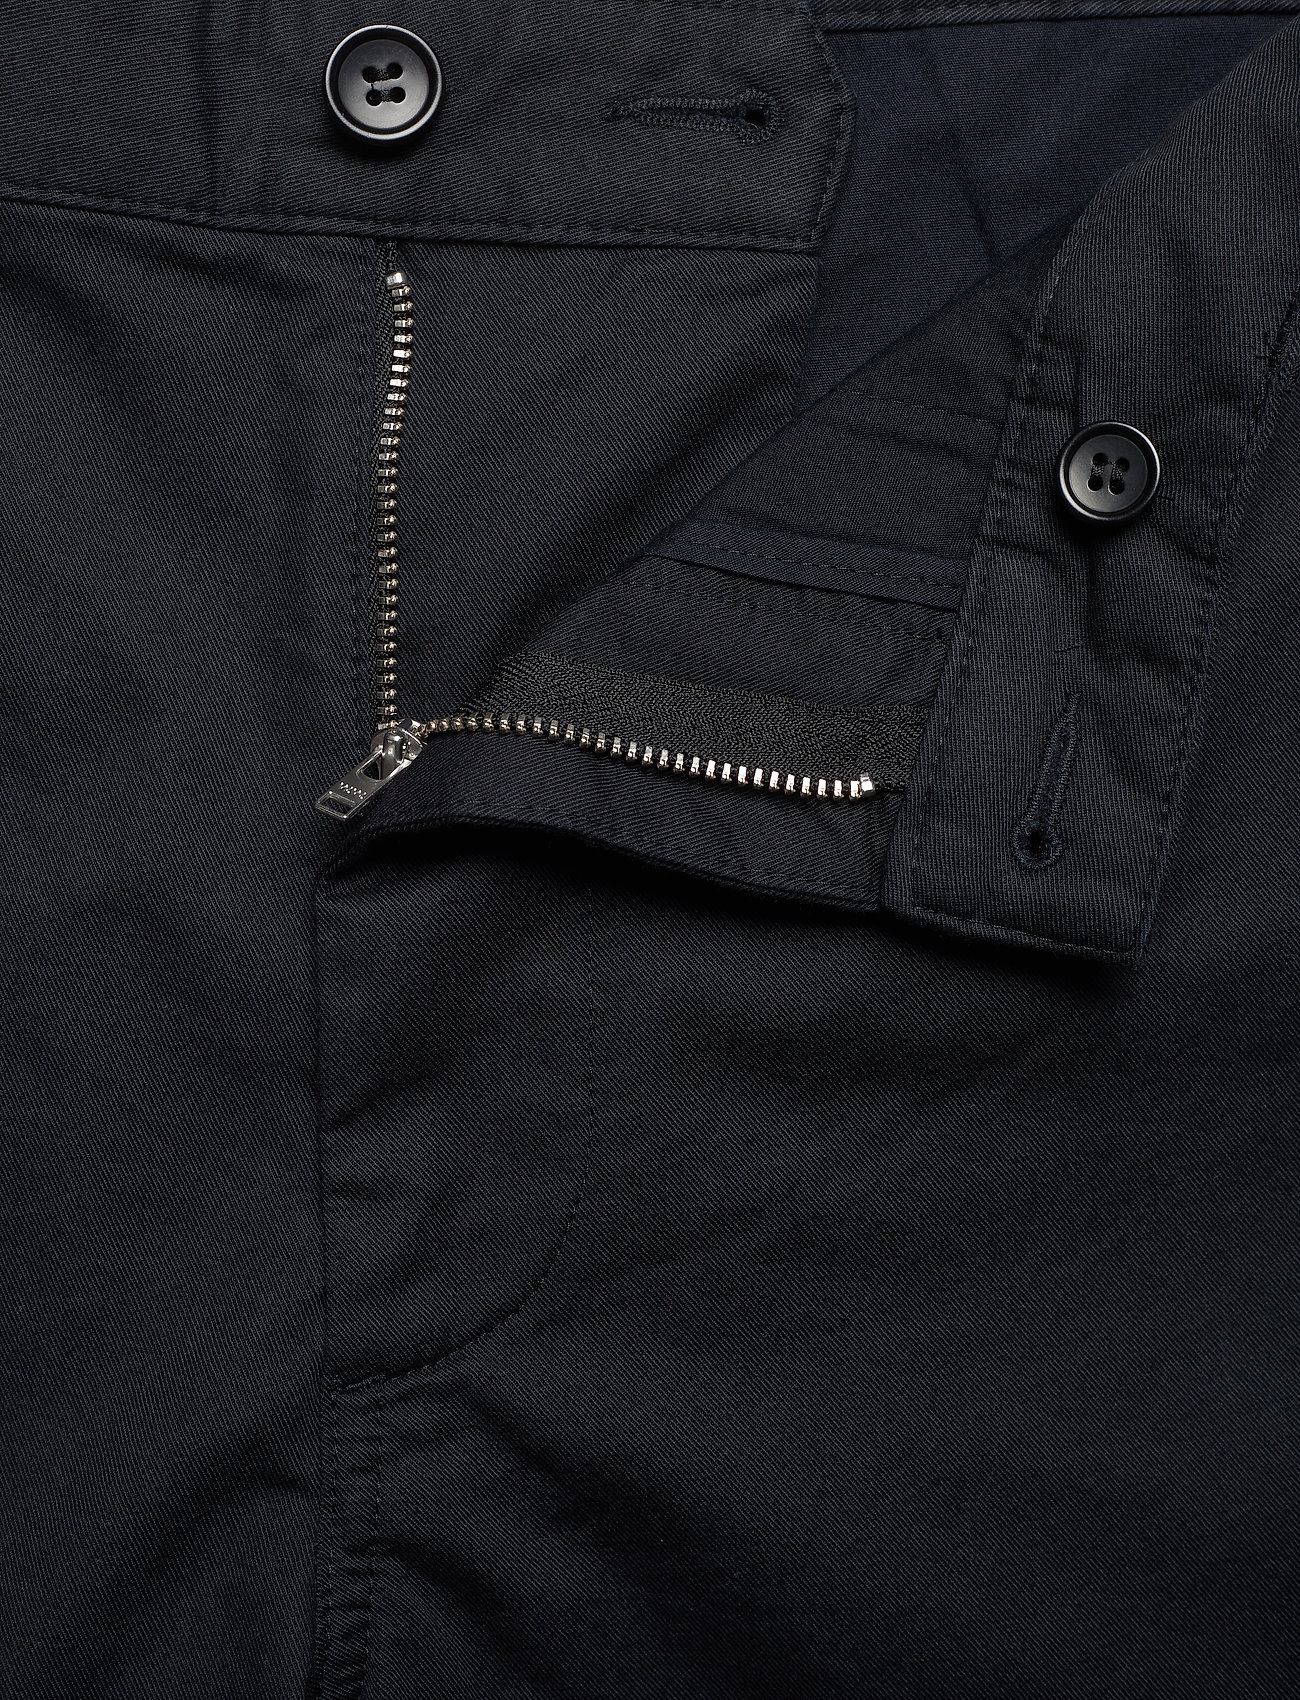 Wood Wood - Jonathan light twill shorts - chino's shorts - black - 4